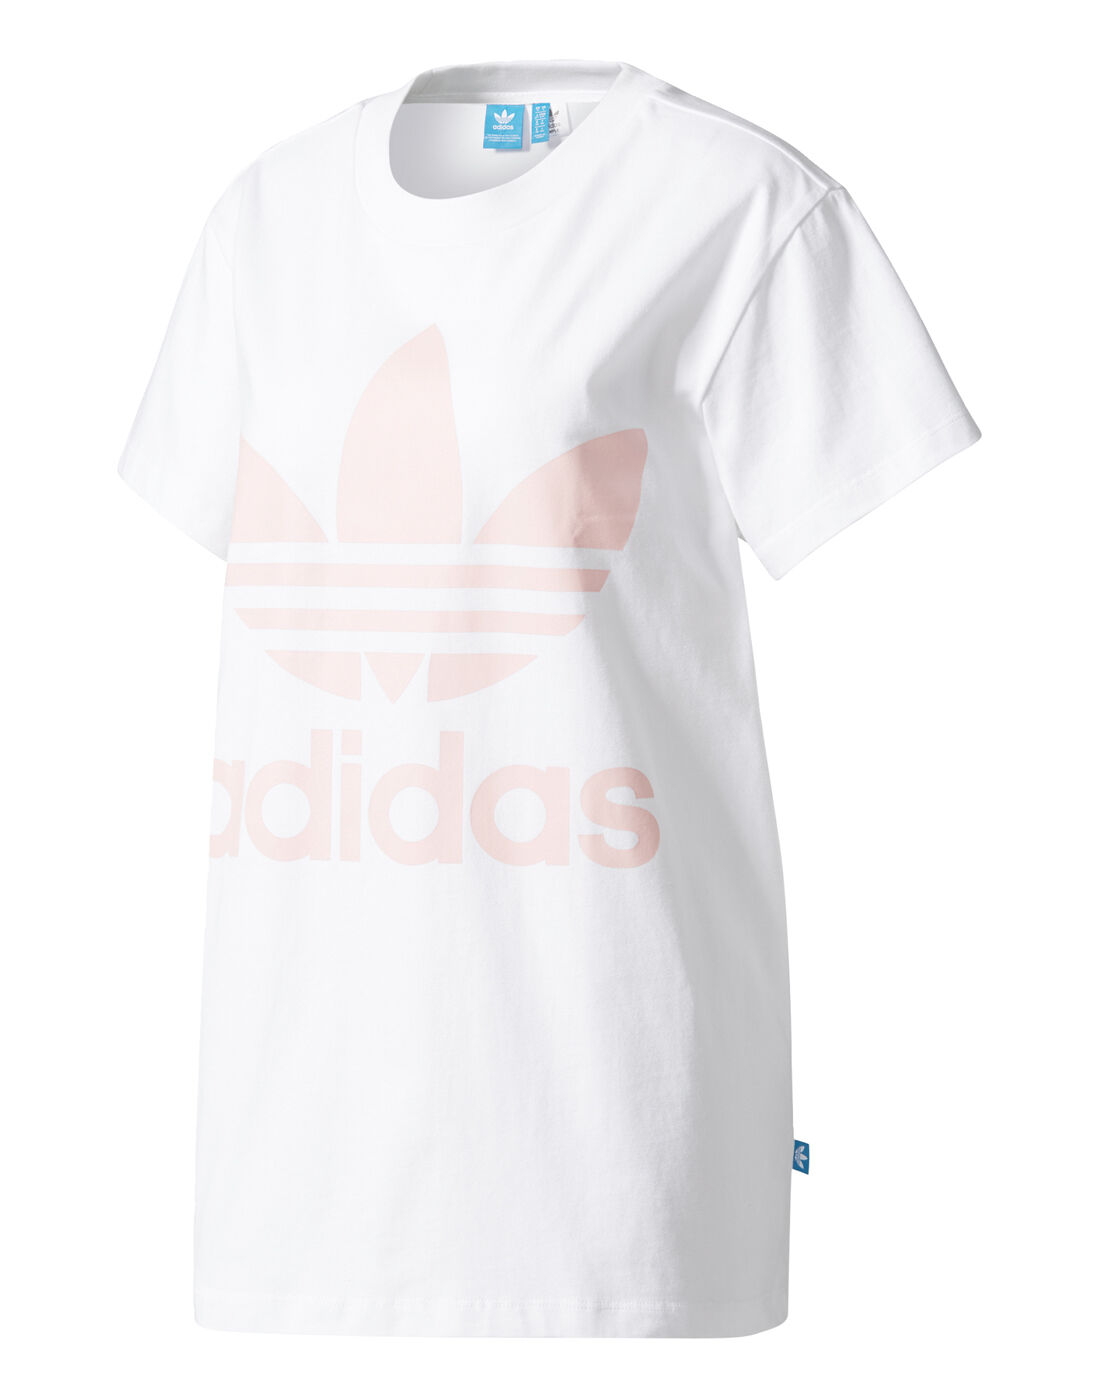 adidas Originals Womens Big Pink Trefoil T shirt | Life